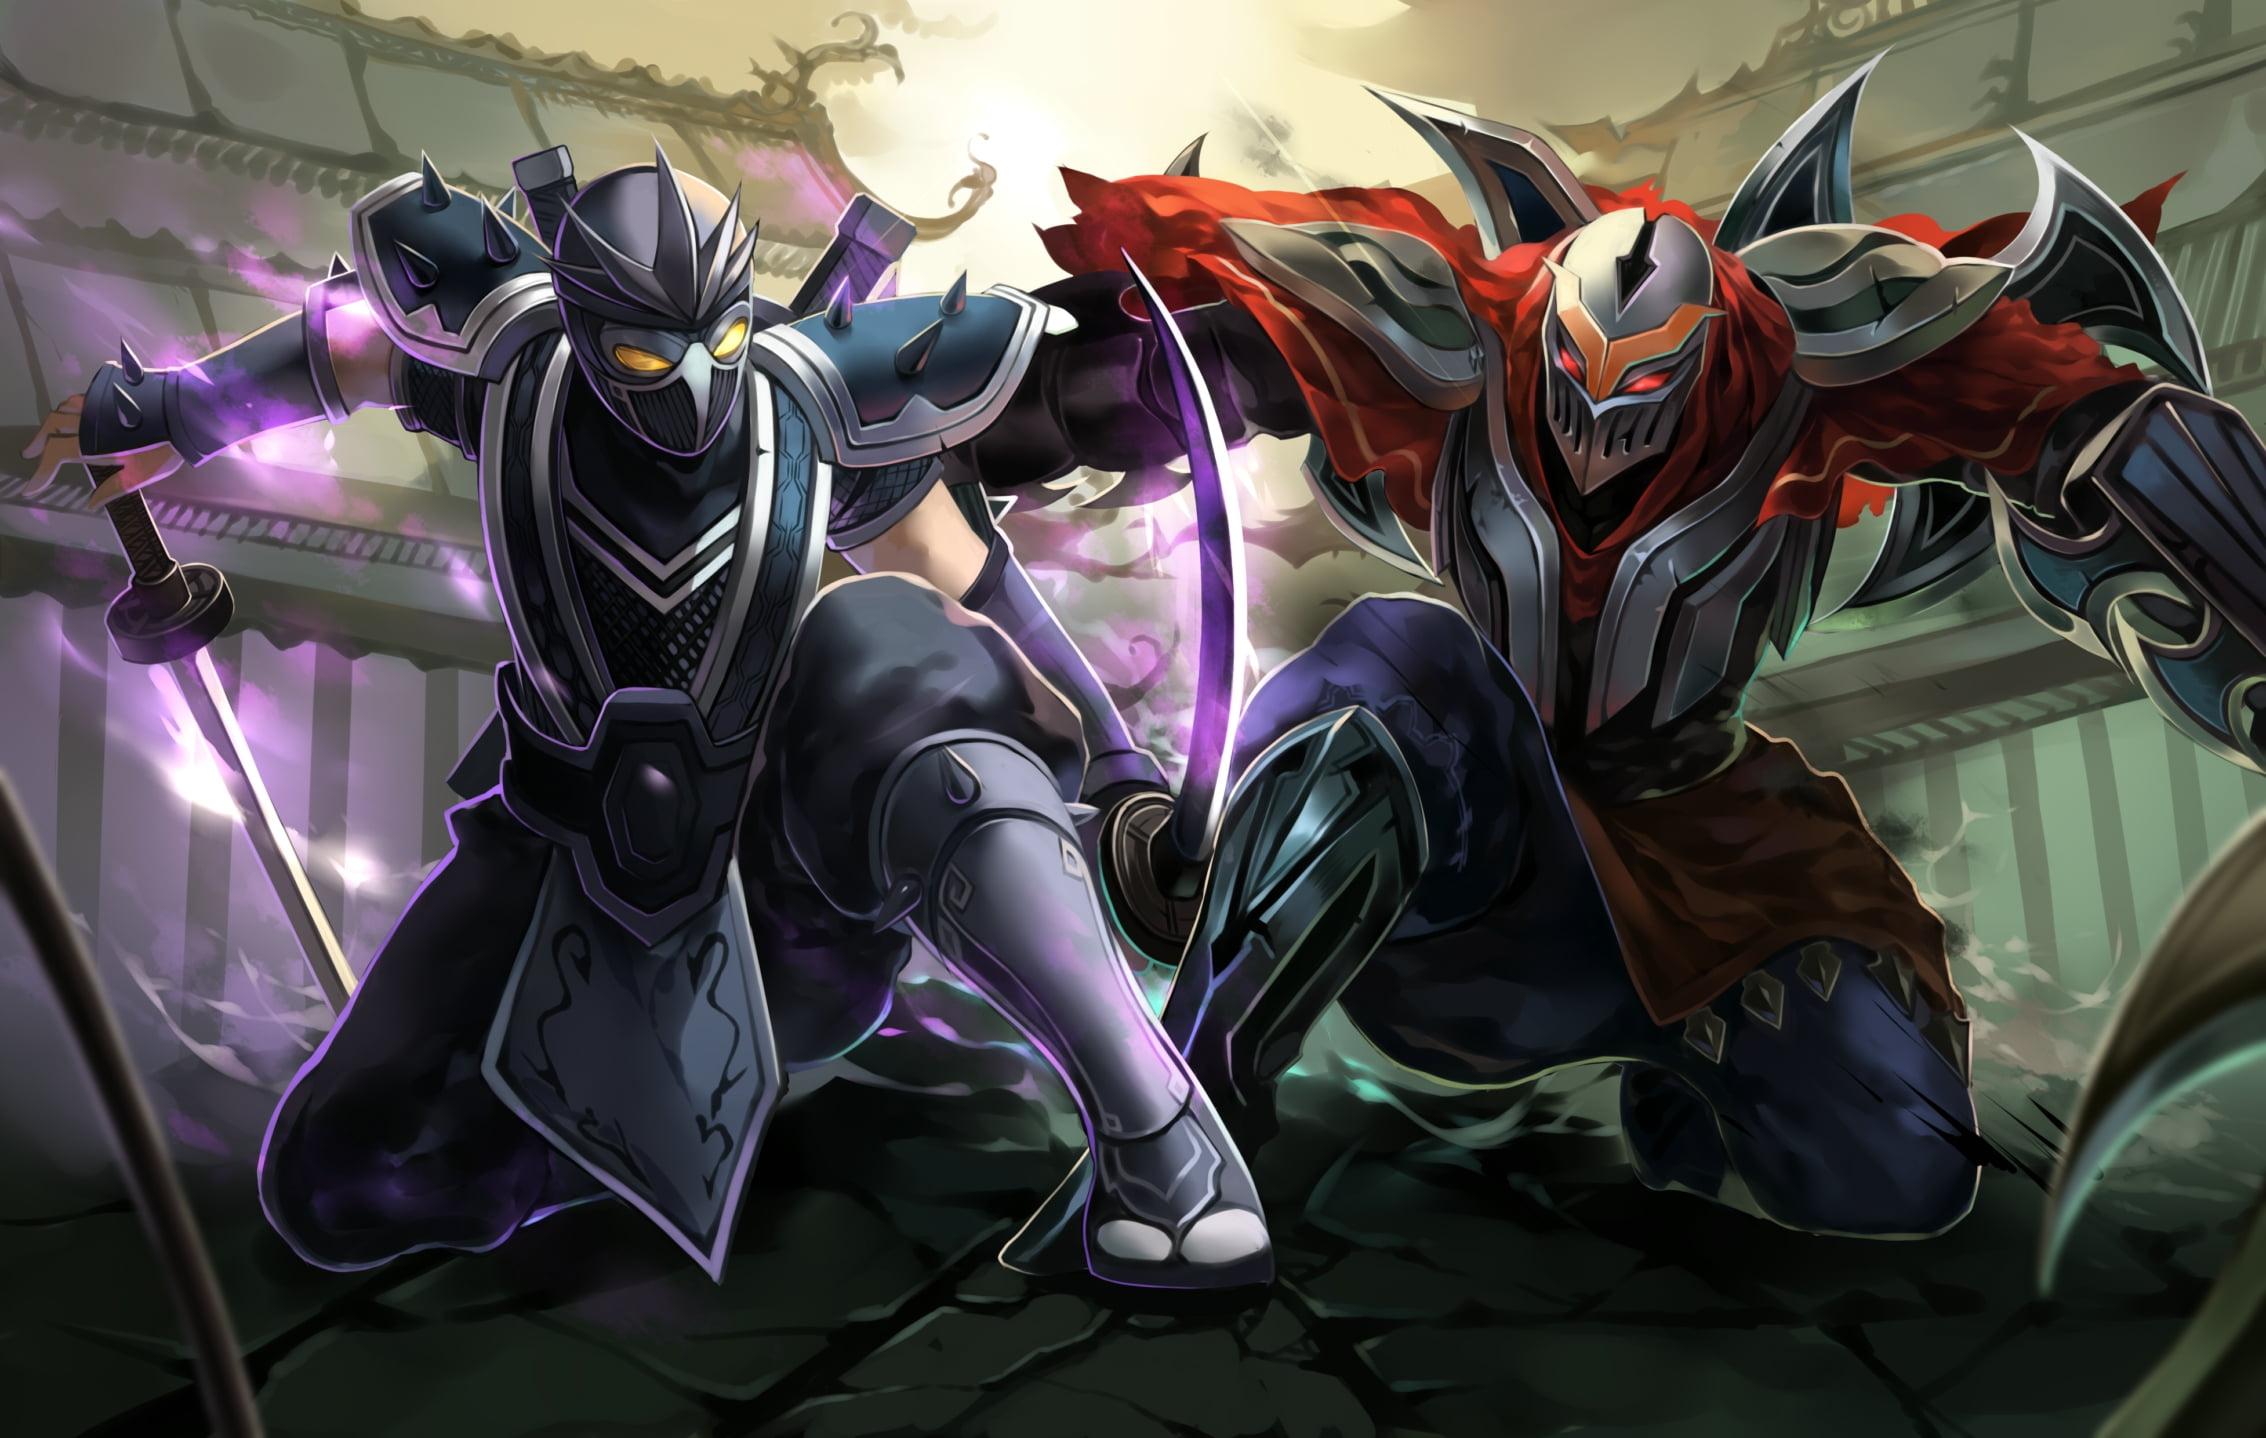 League Of Legends Hd 4k 3292745 Hd Wallpaper Backgrounds Download